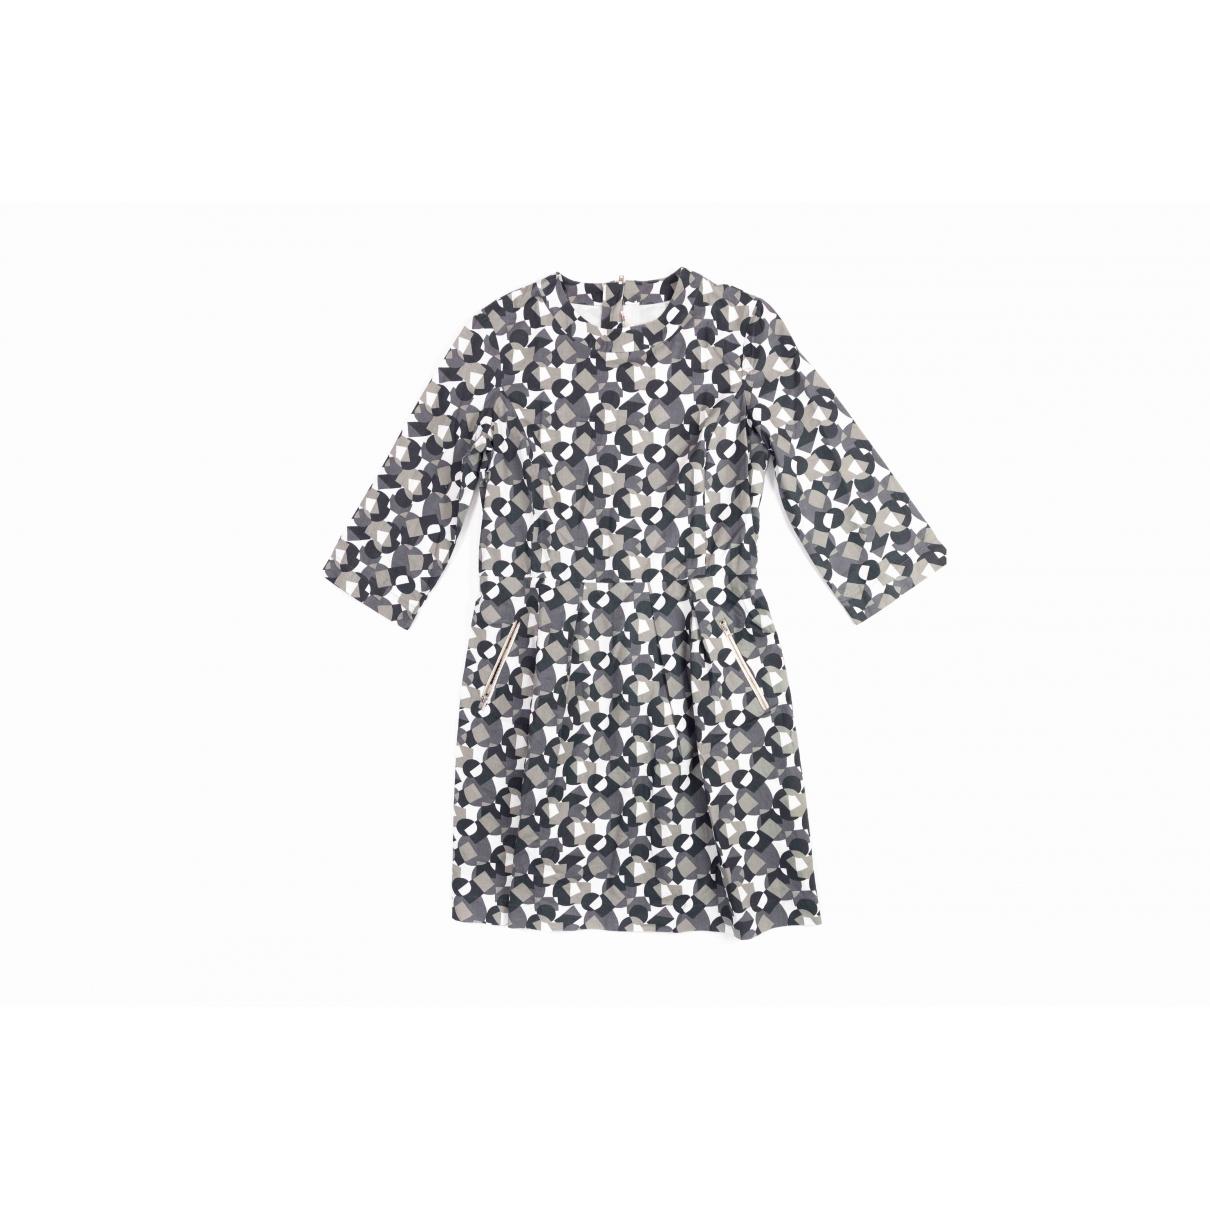 Bonpoint \N Grey Cotton dress for Women L International